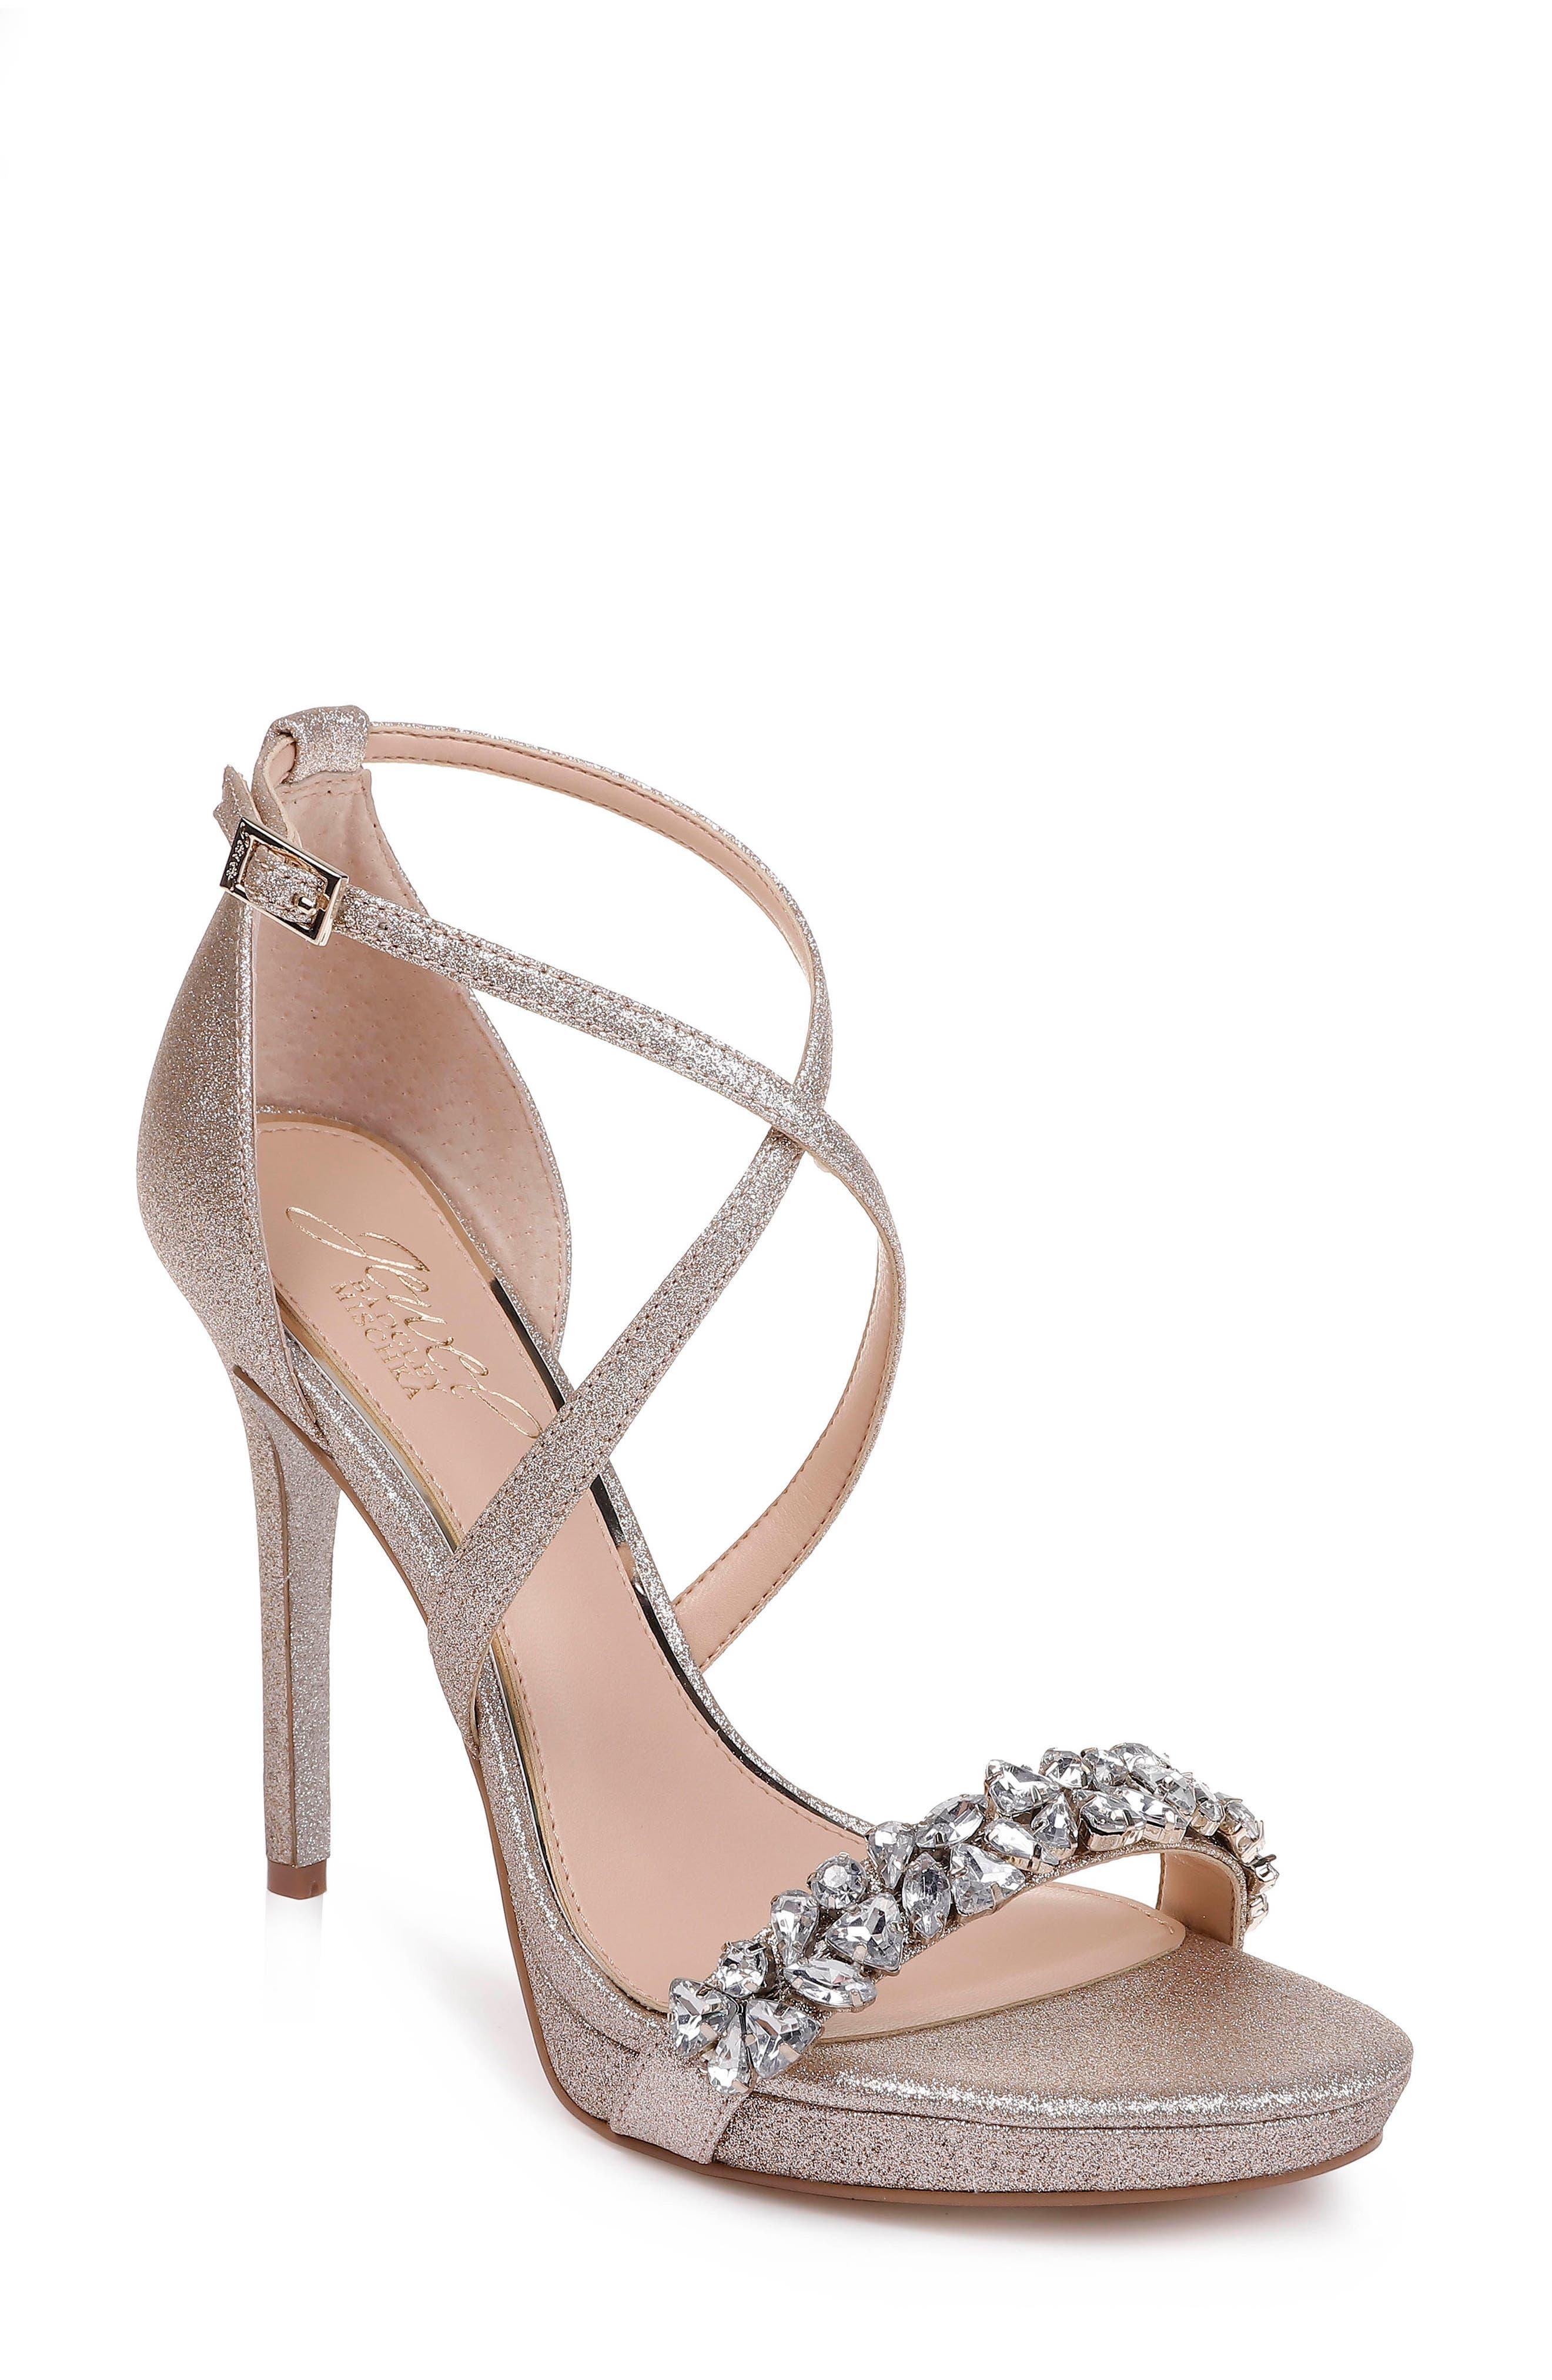 Jewel Badgley Mischka Dany Strappy Sandal- Metallic